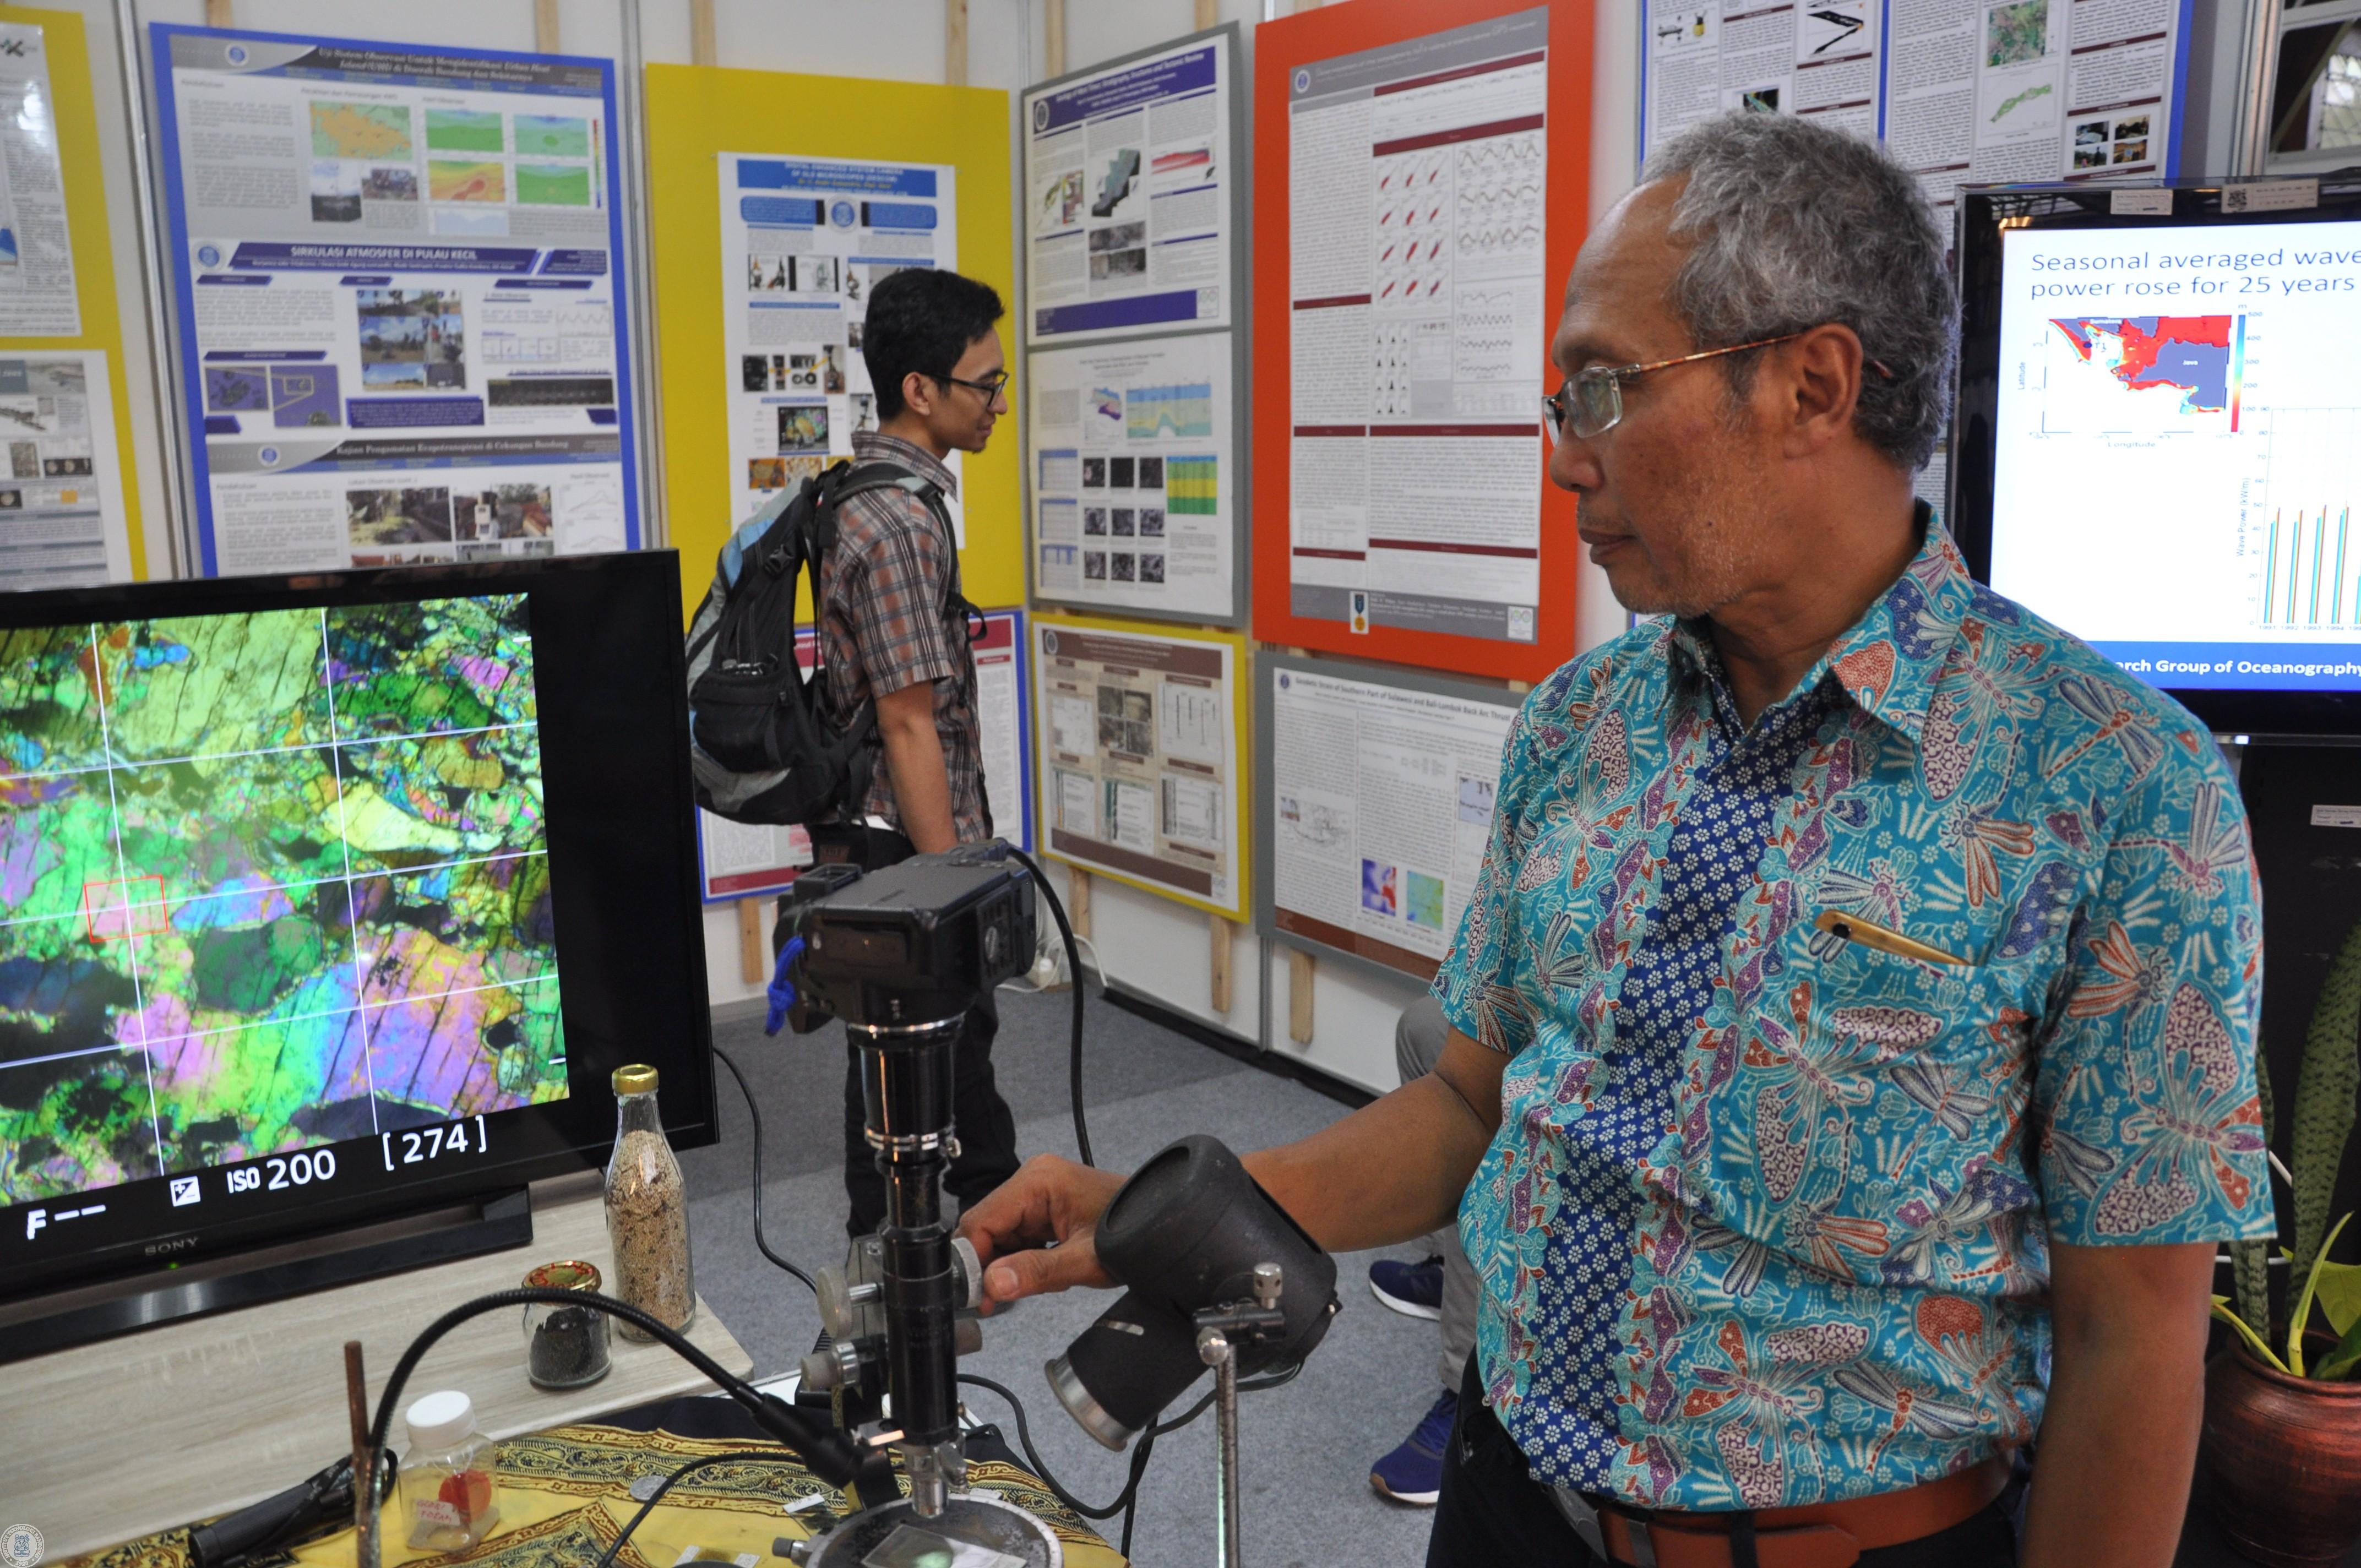 descom-reviving-a-century-old-microscope